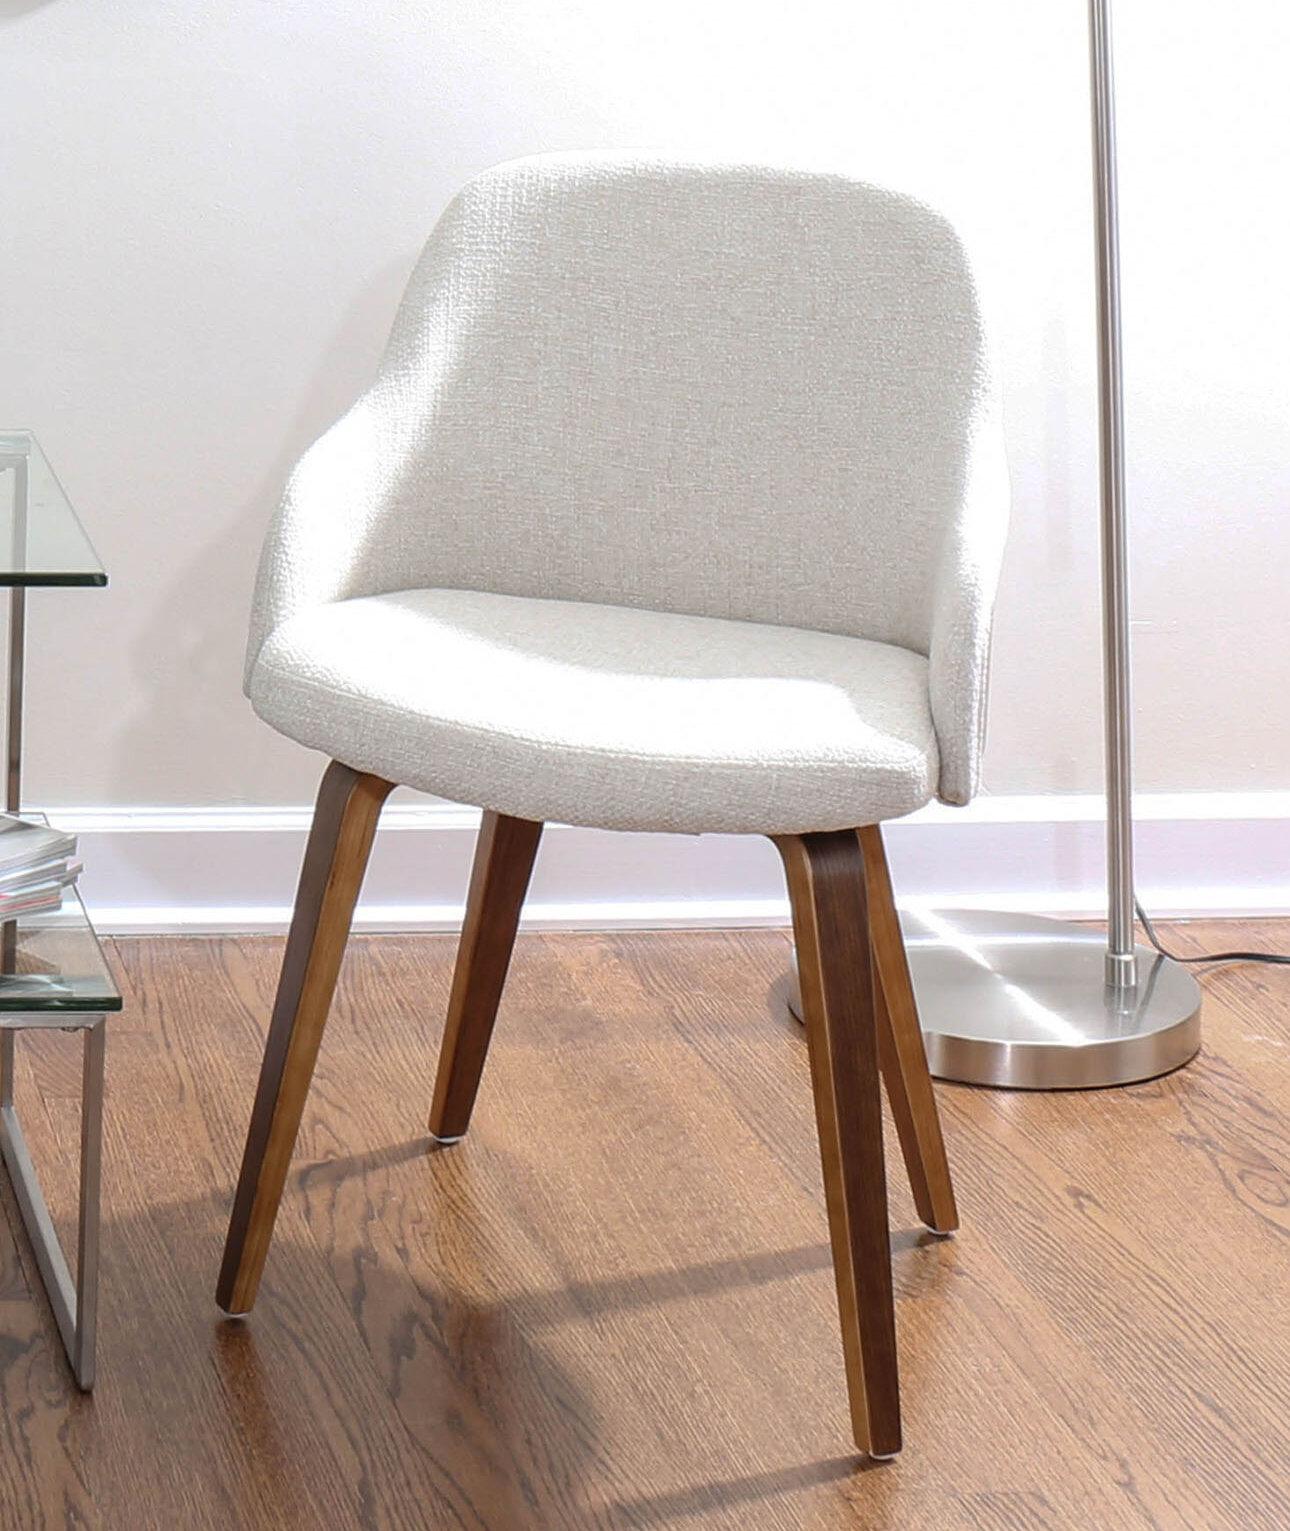 George Oliver Ripton Mid Century Modern Coffee Table: George Oliver Brighton Mid-Century Modern Upholstered